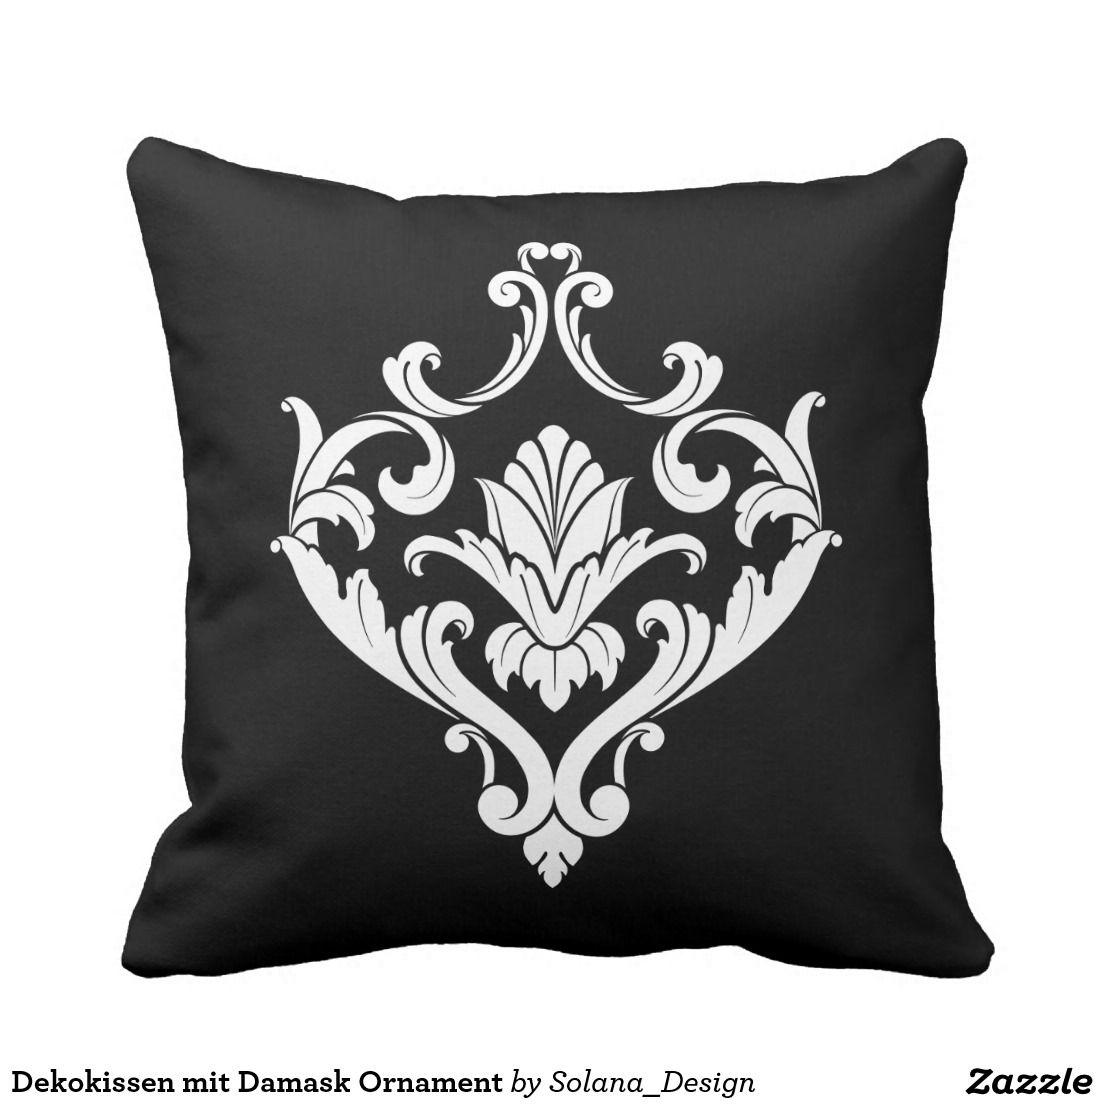 Marvelous Dekokissen Mit Damask Ornament Kissen